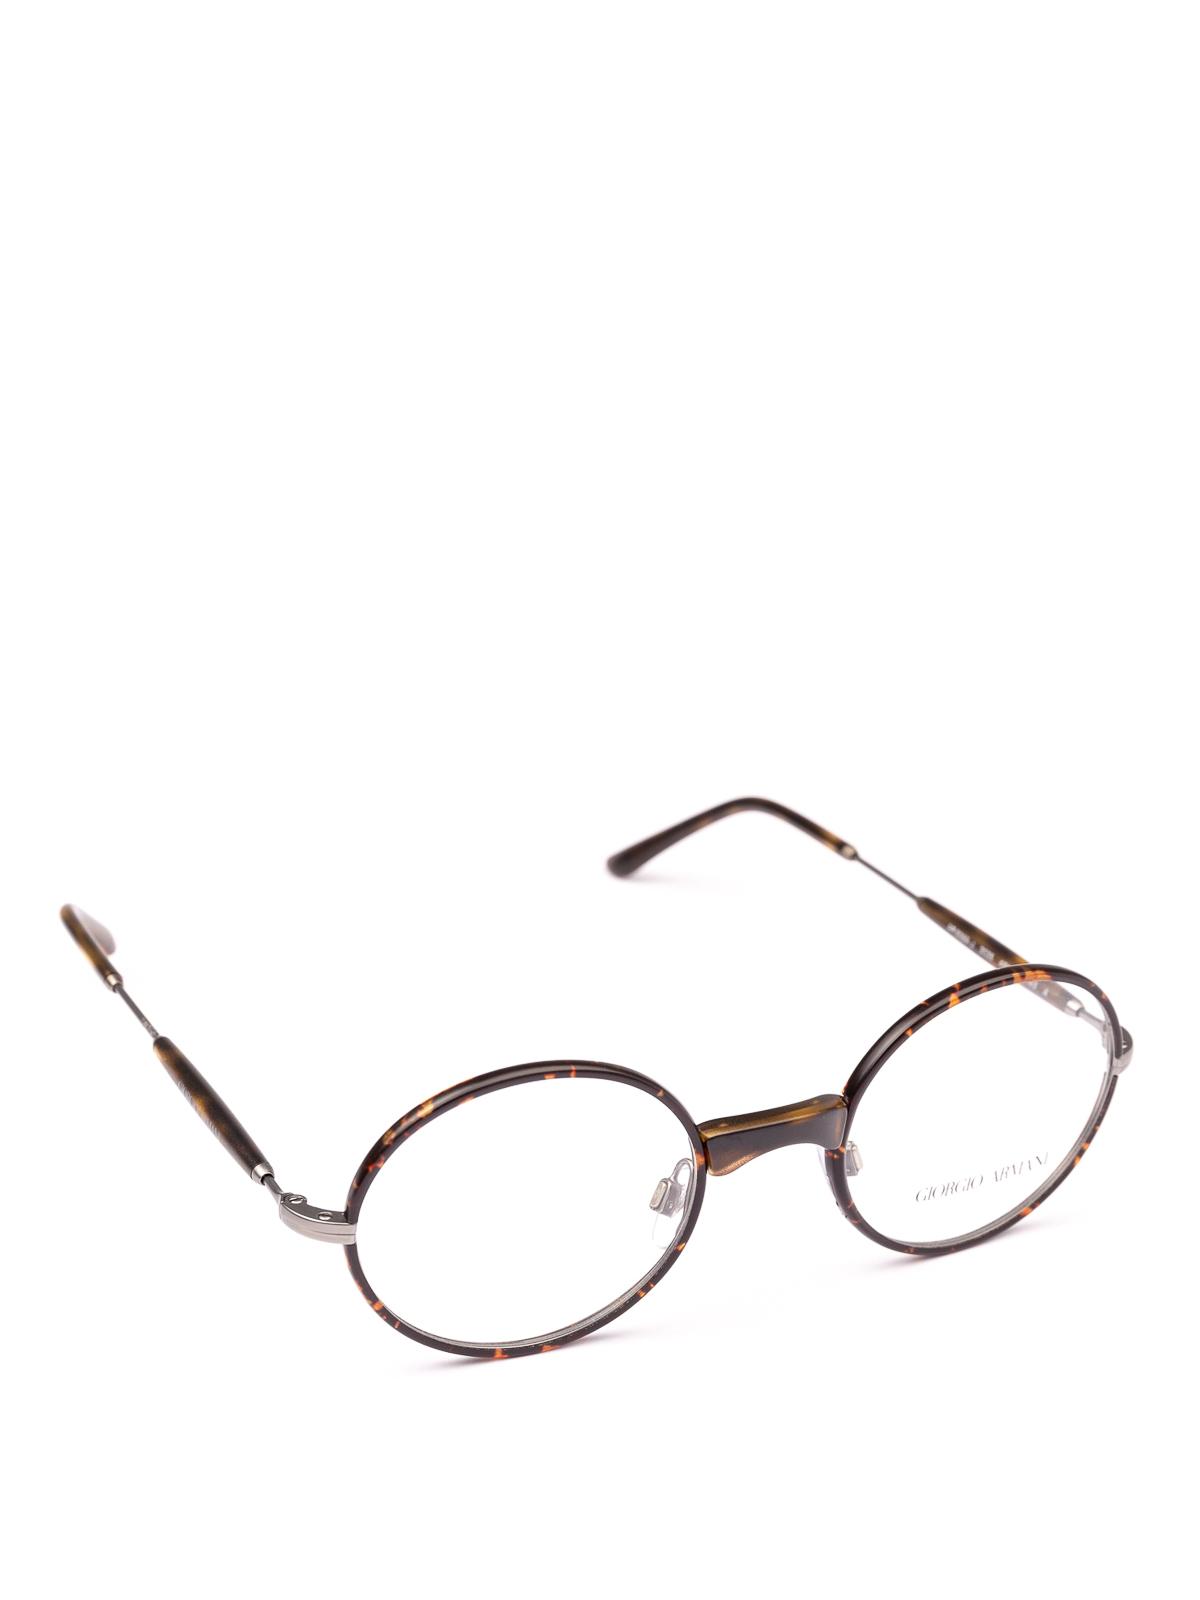 b0e74f0e92a6 Giorgio Armani - Havana slender frame oval eyeglasses - glasses ...